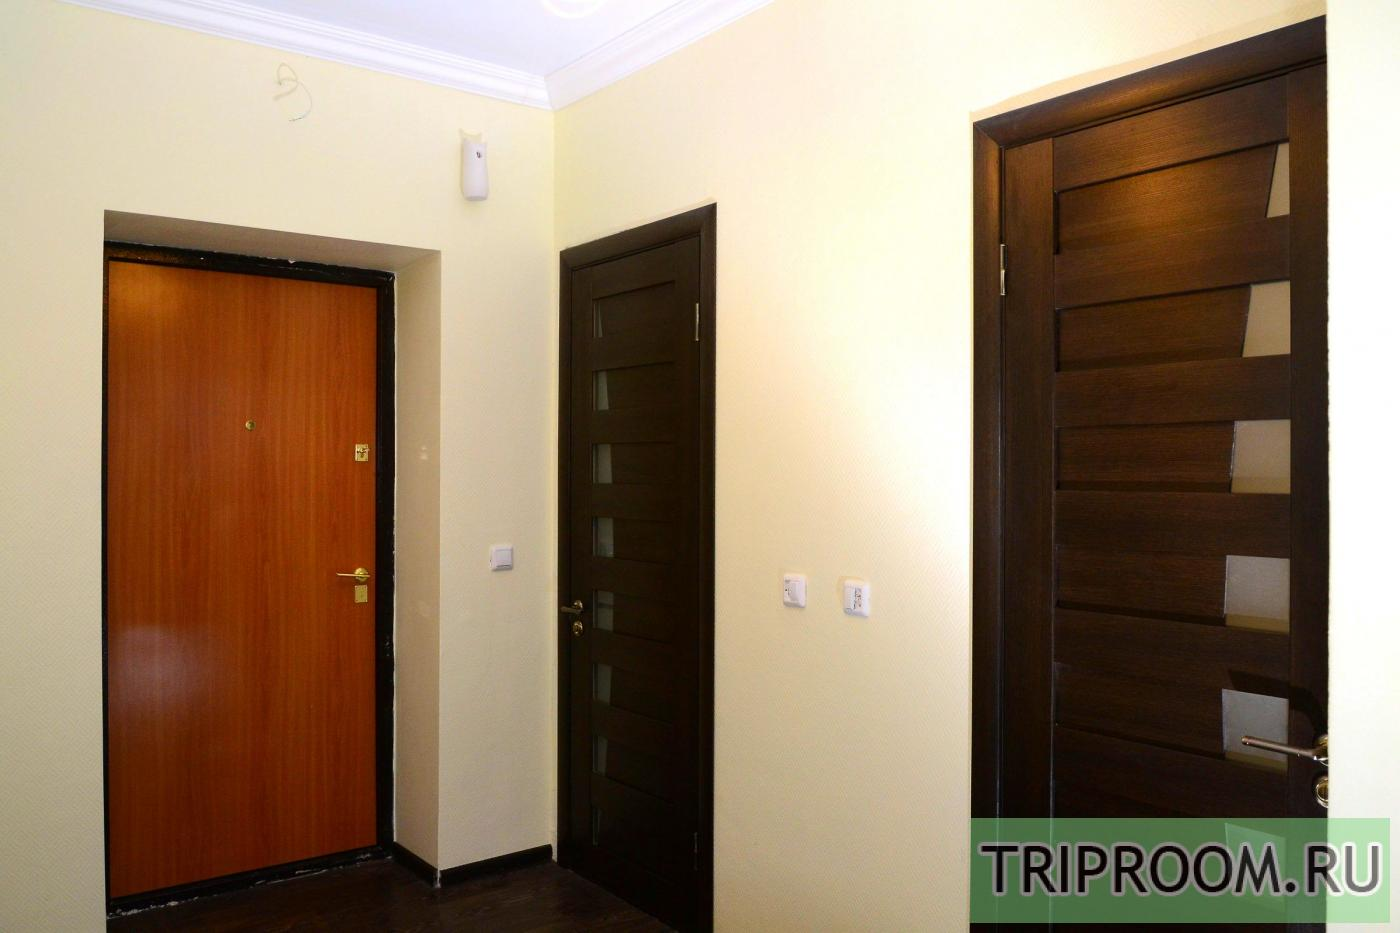 1-комнатная квартира посуточно (вариант № 14713), ул. Петра Смородина улица, фото № 15